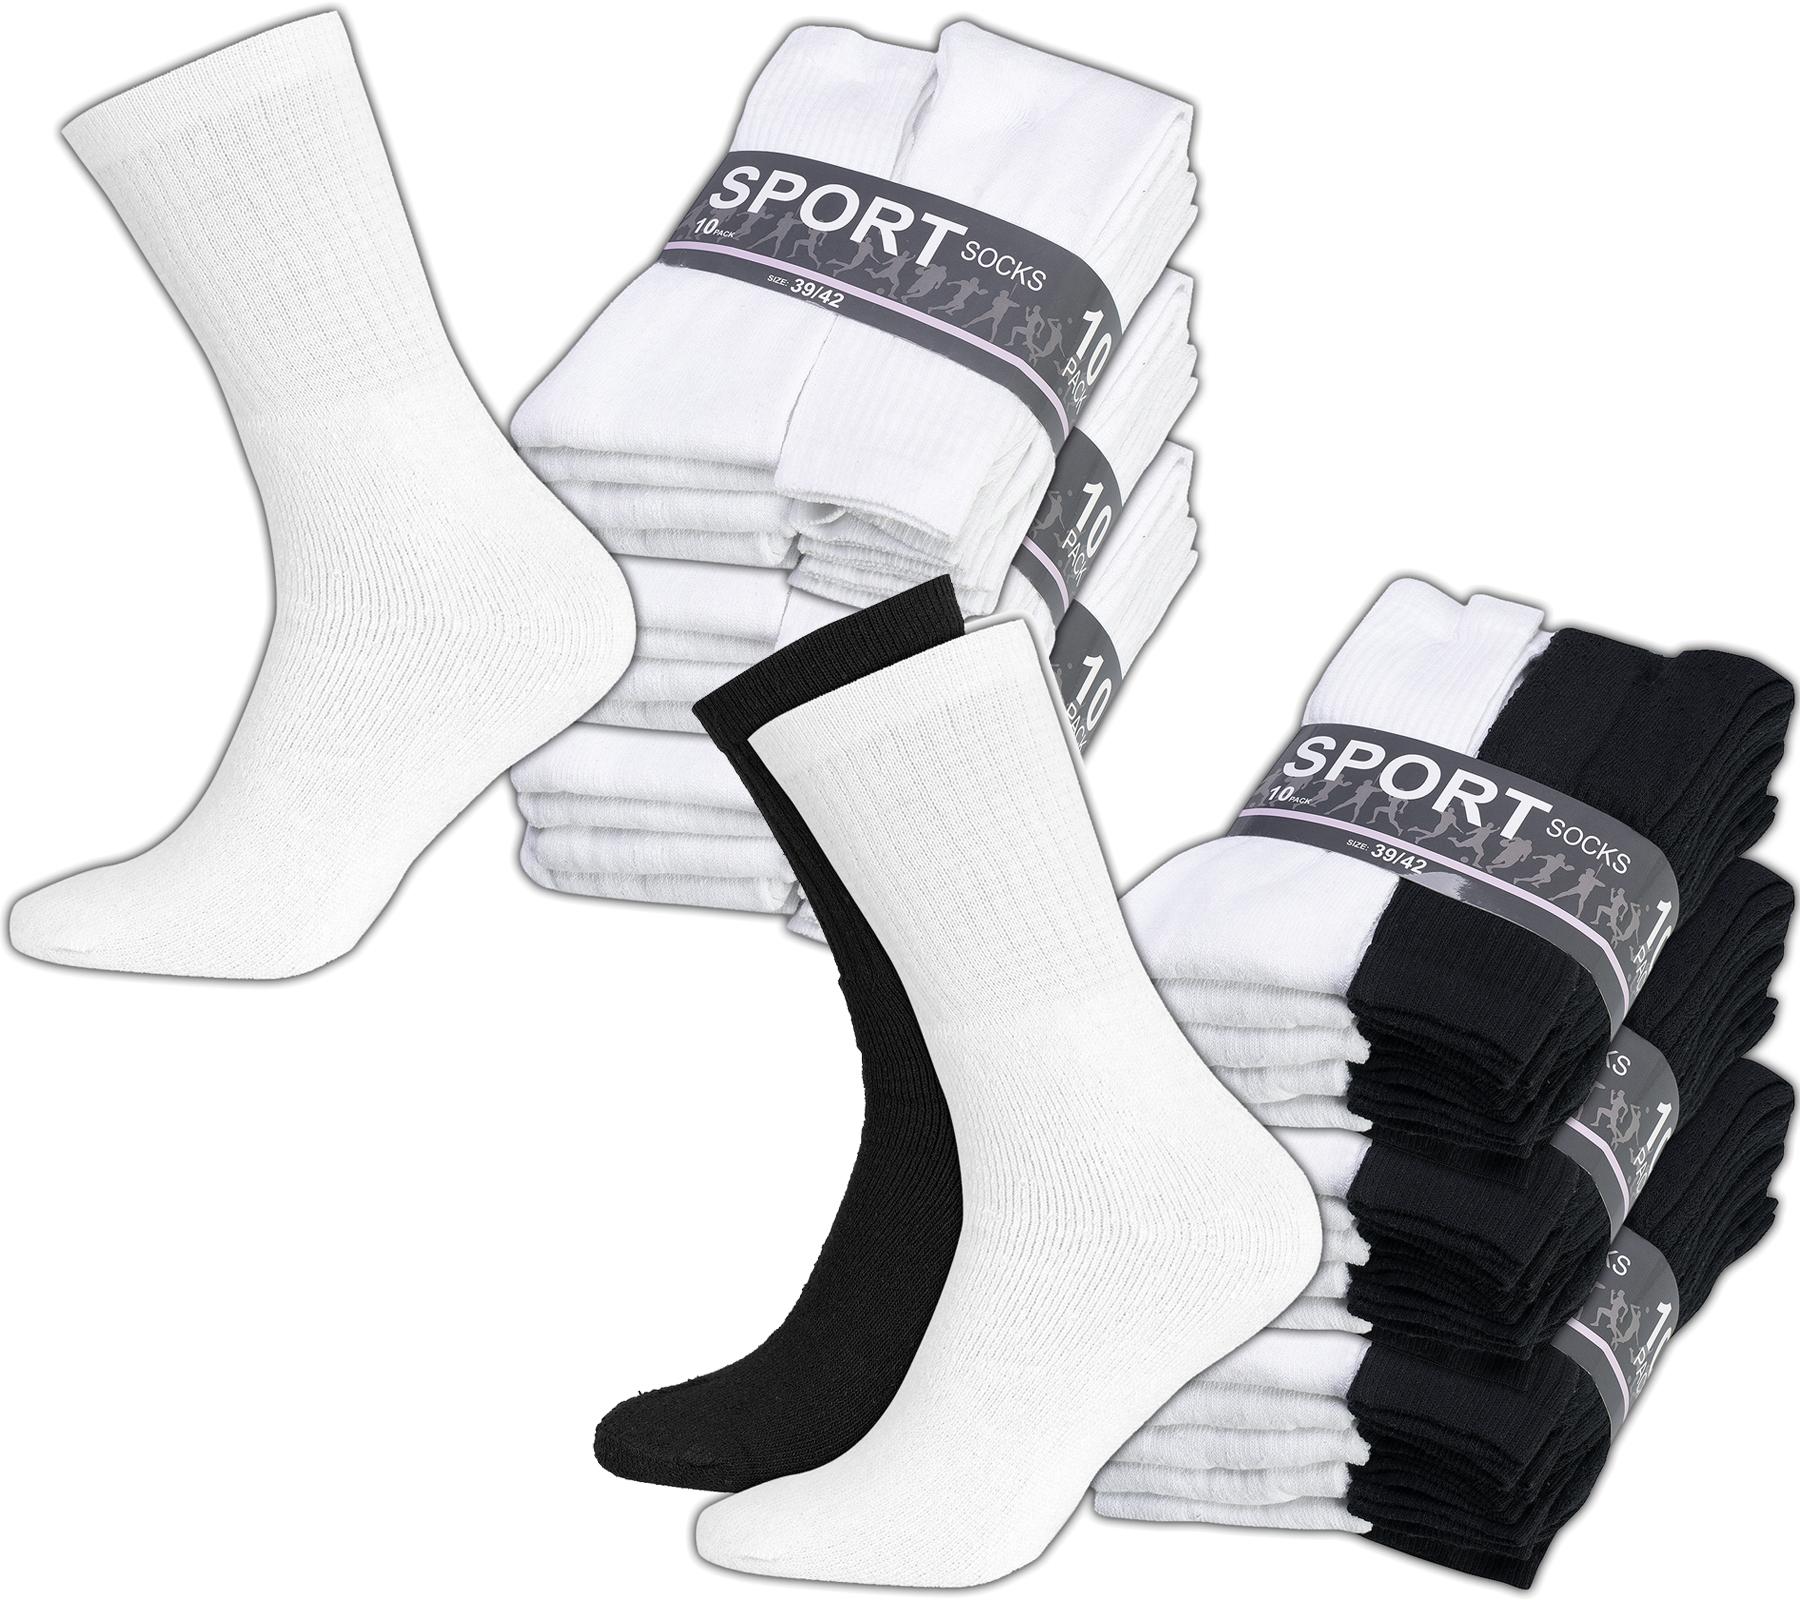 [Outlet46.de] 30er Pack Sport Socks Sportsocken für 9,99€